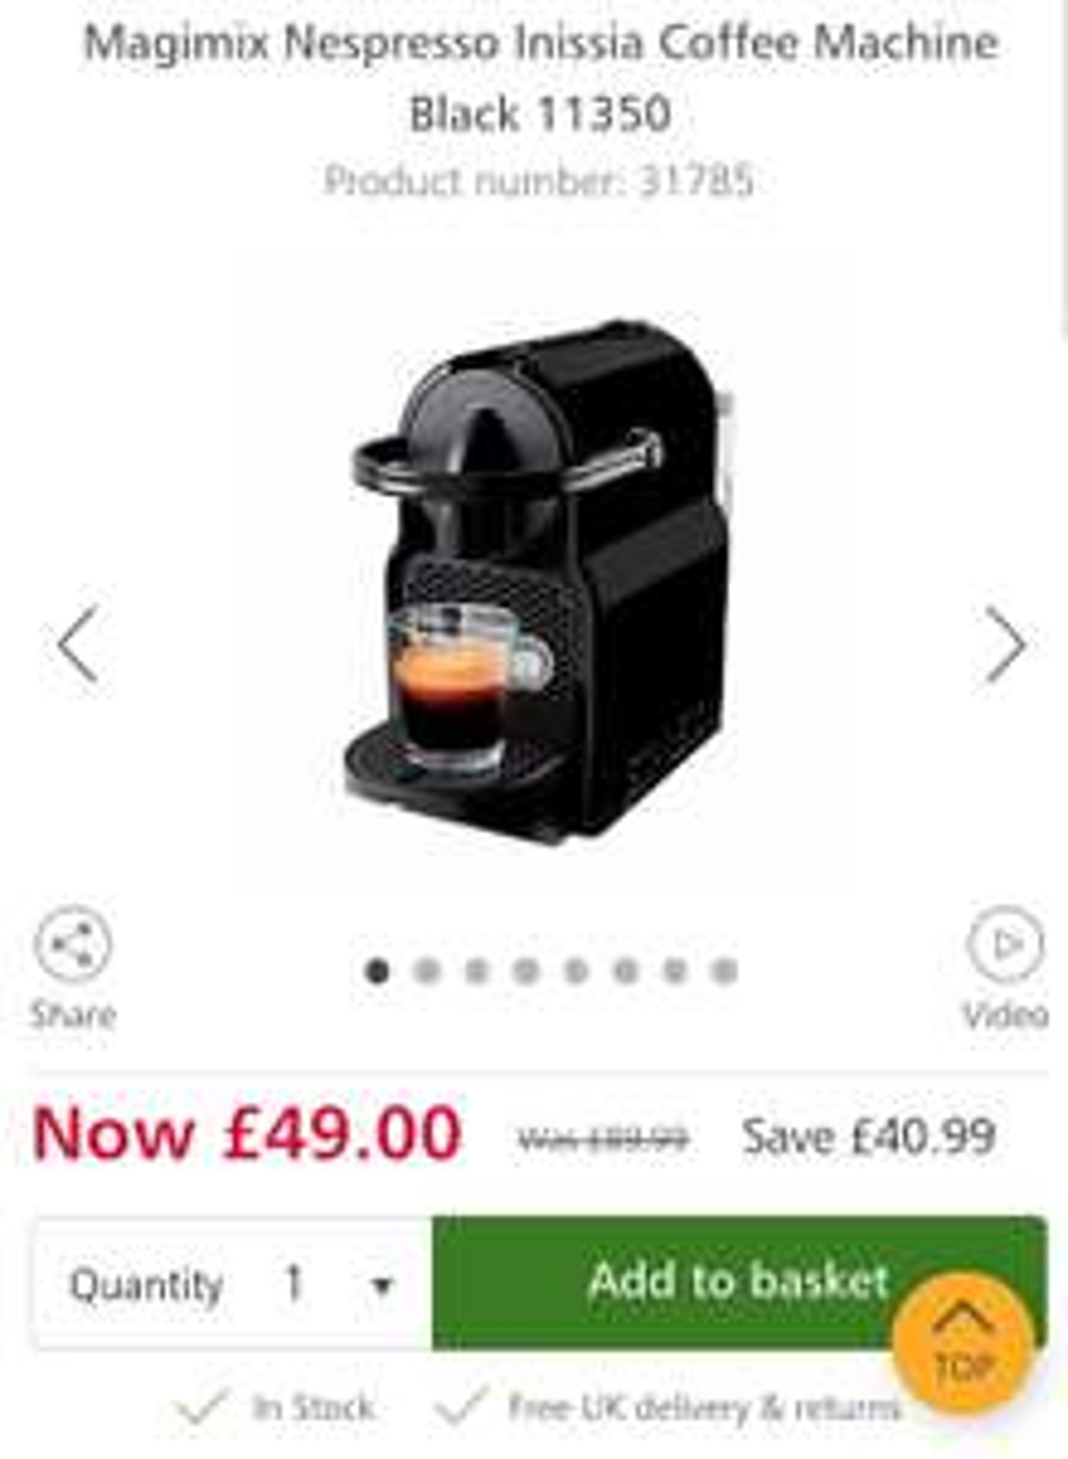 Lakeland-Magimix Nespresso Inissia Coffee Machine £49